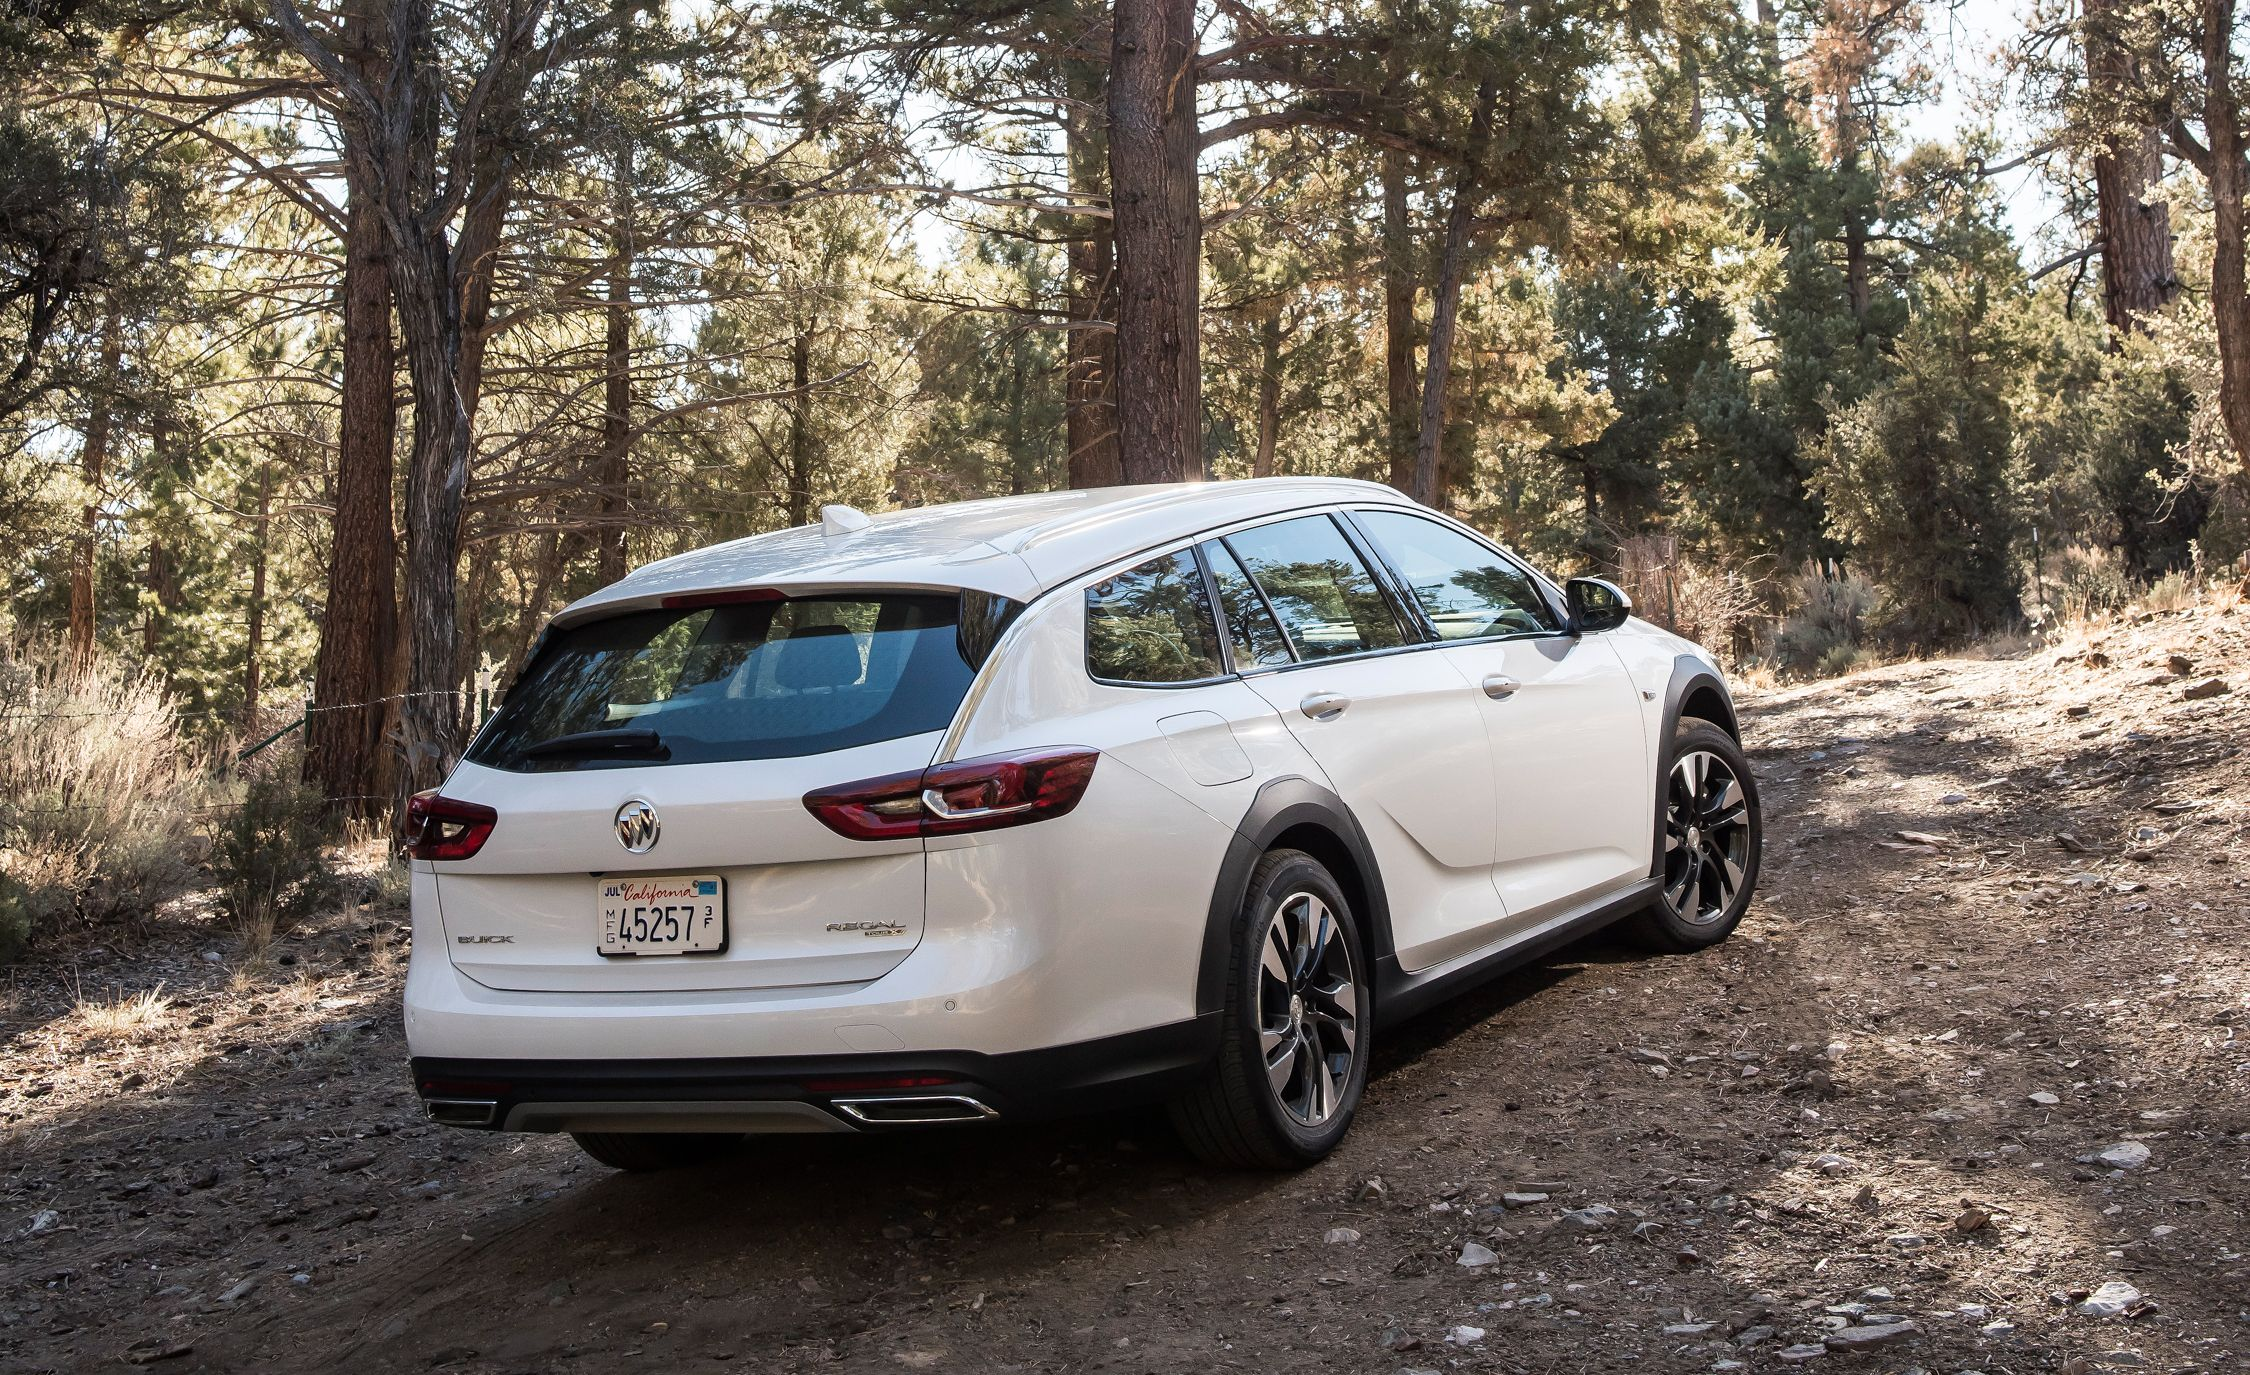 2019 Buick Regal Tourx Reviews Price Photos And Specs Car Driver